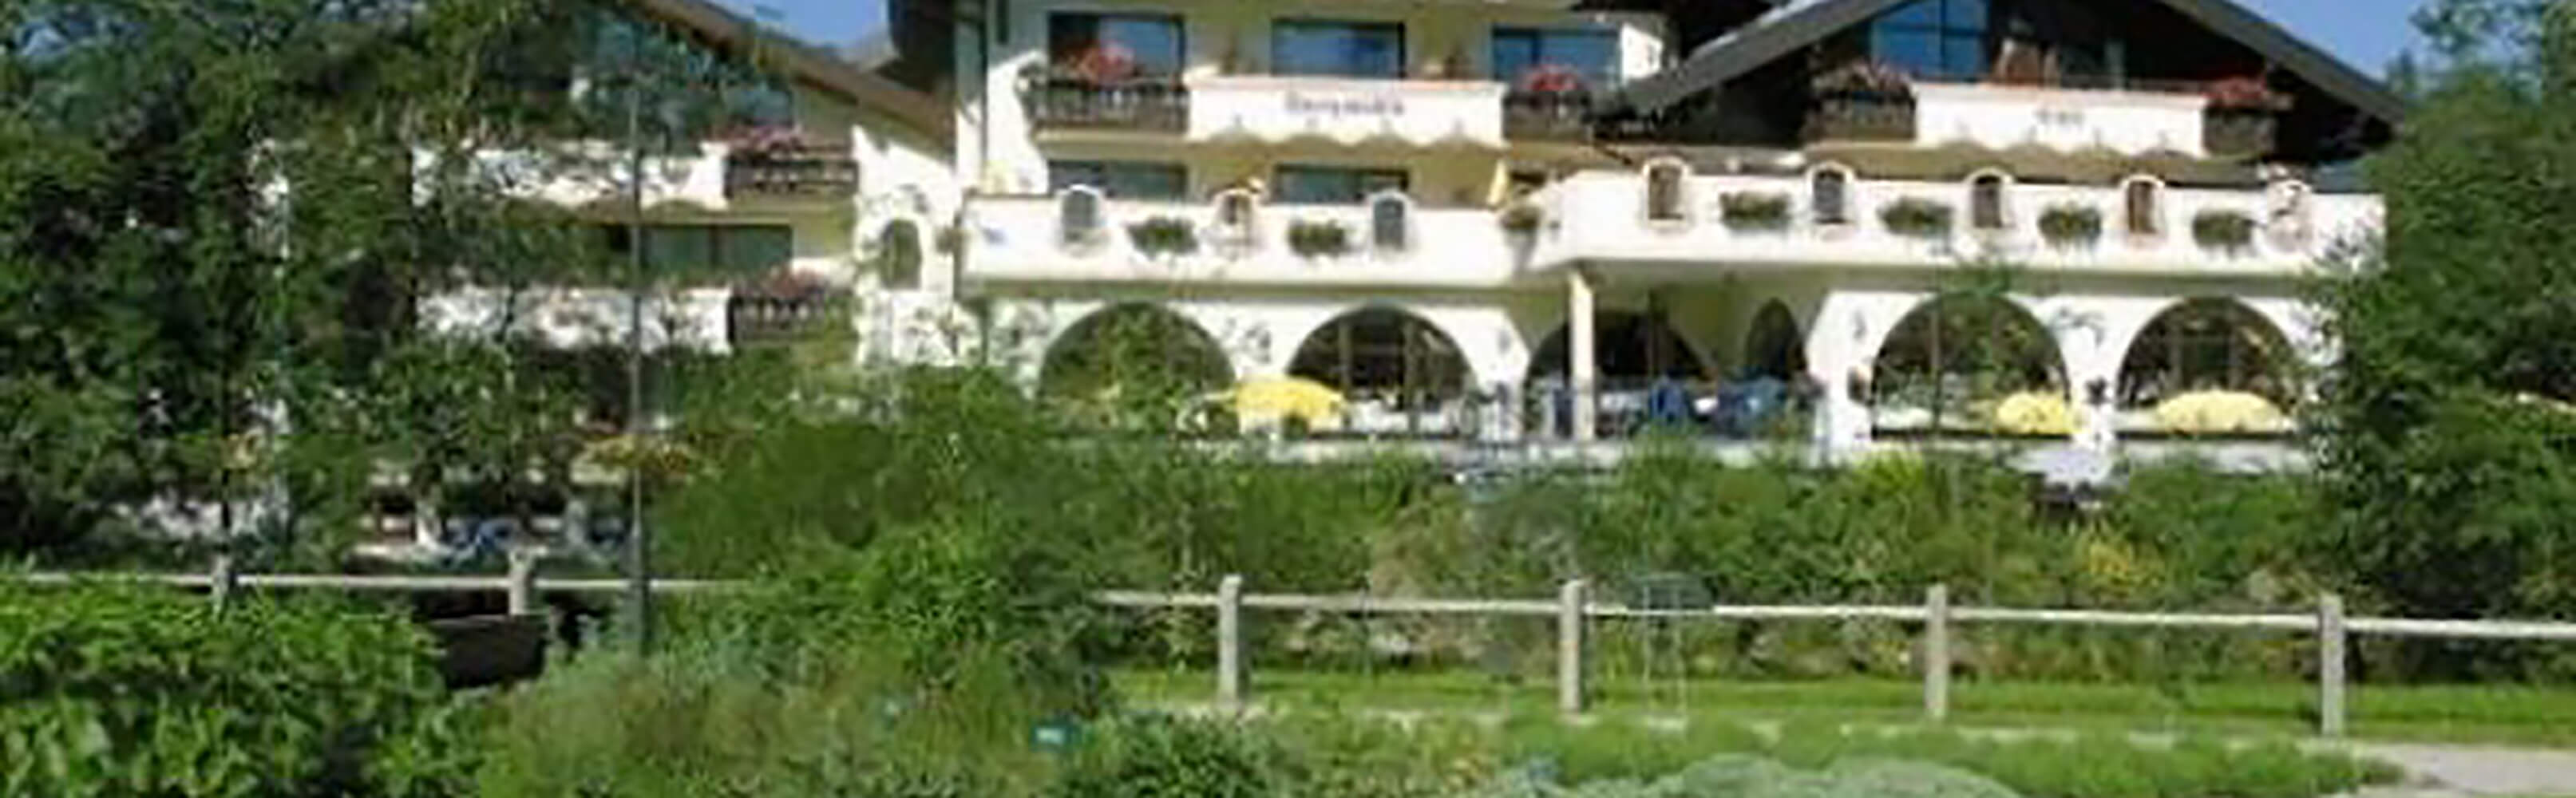 Parkhotel Burgmühle